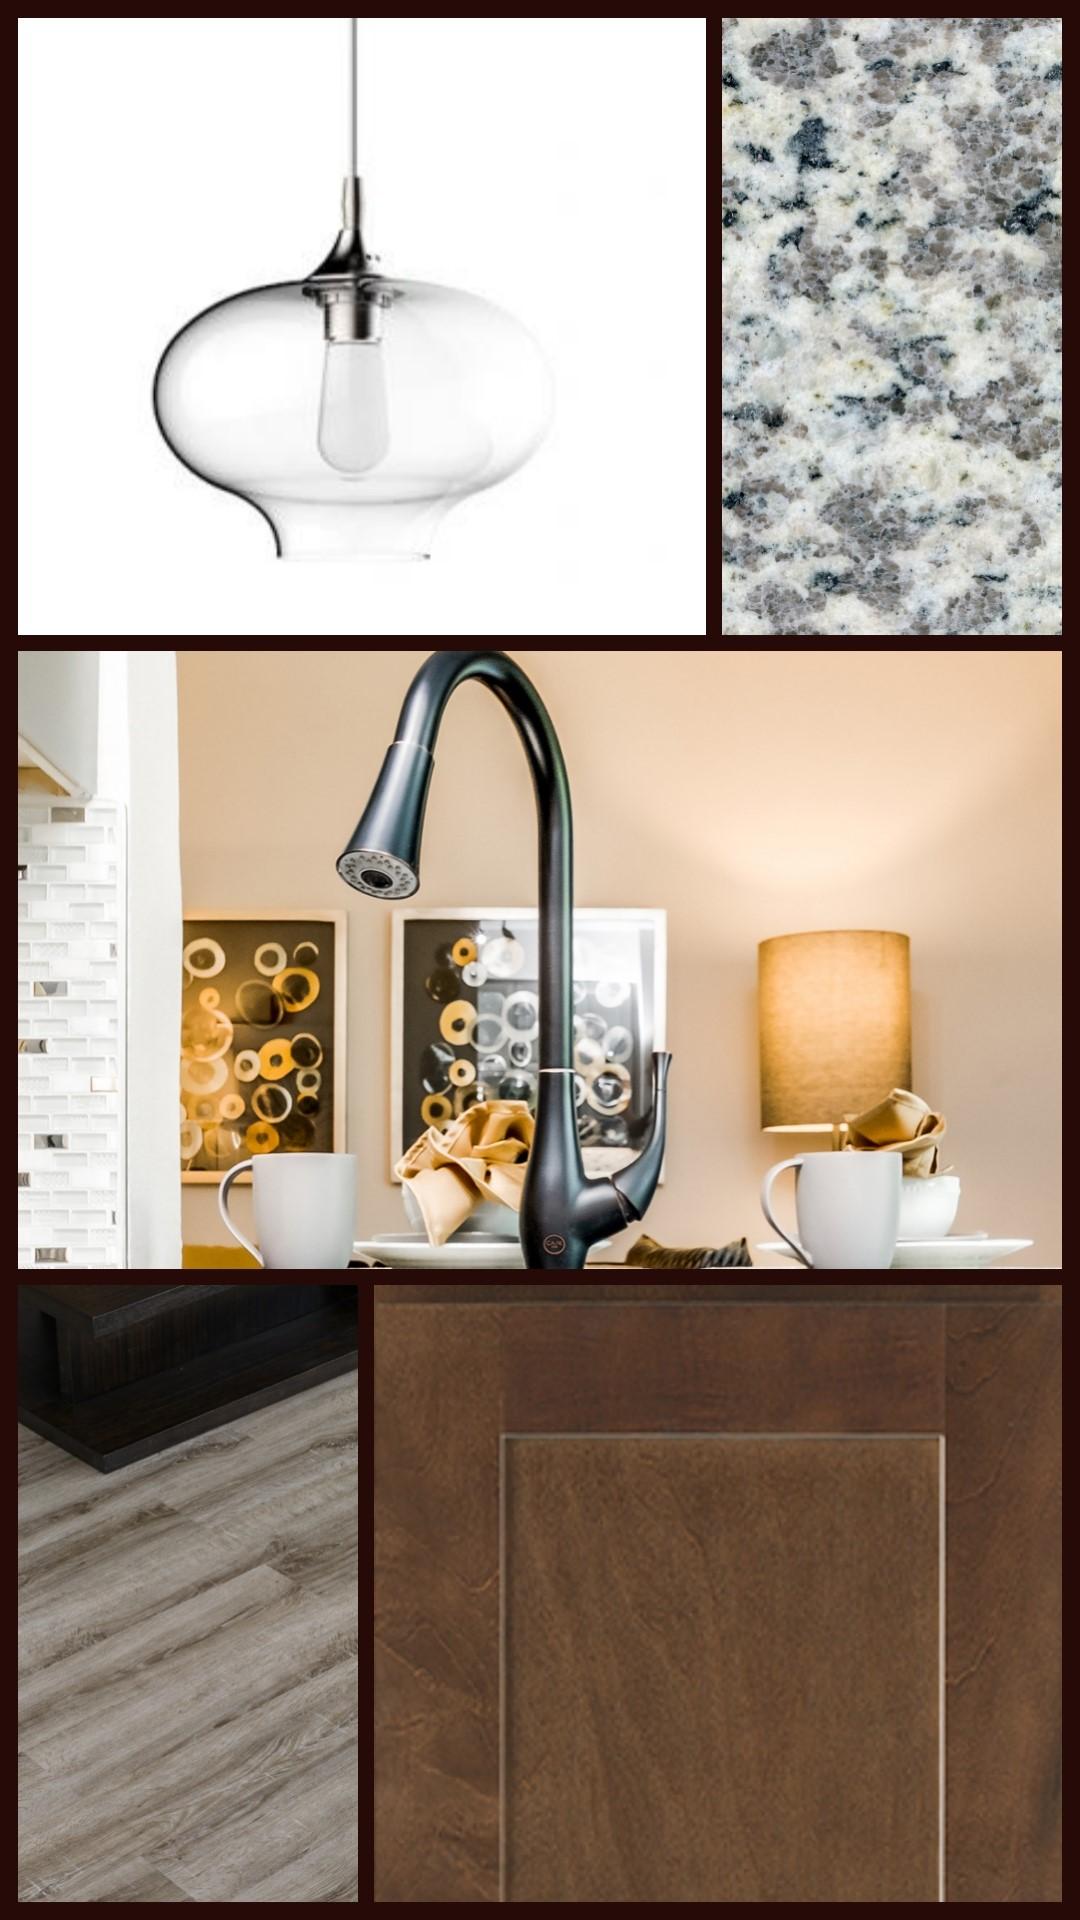 High End Finishes Including Solid Maple Wood Cabinetry In Walnut Finish,  Elegant Granite Countertops In Kitchen U0026 Bathroom(s), U0026 Luxury Vinyl Plank  Flooring ...